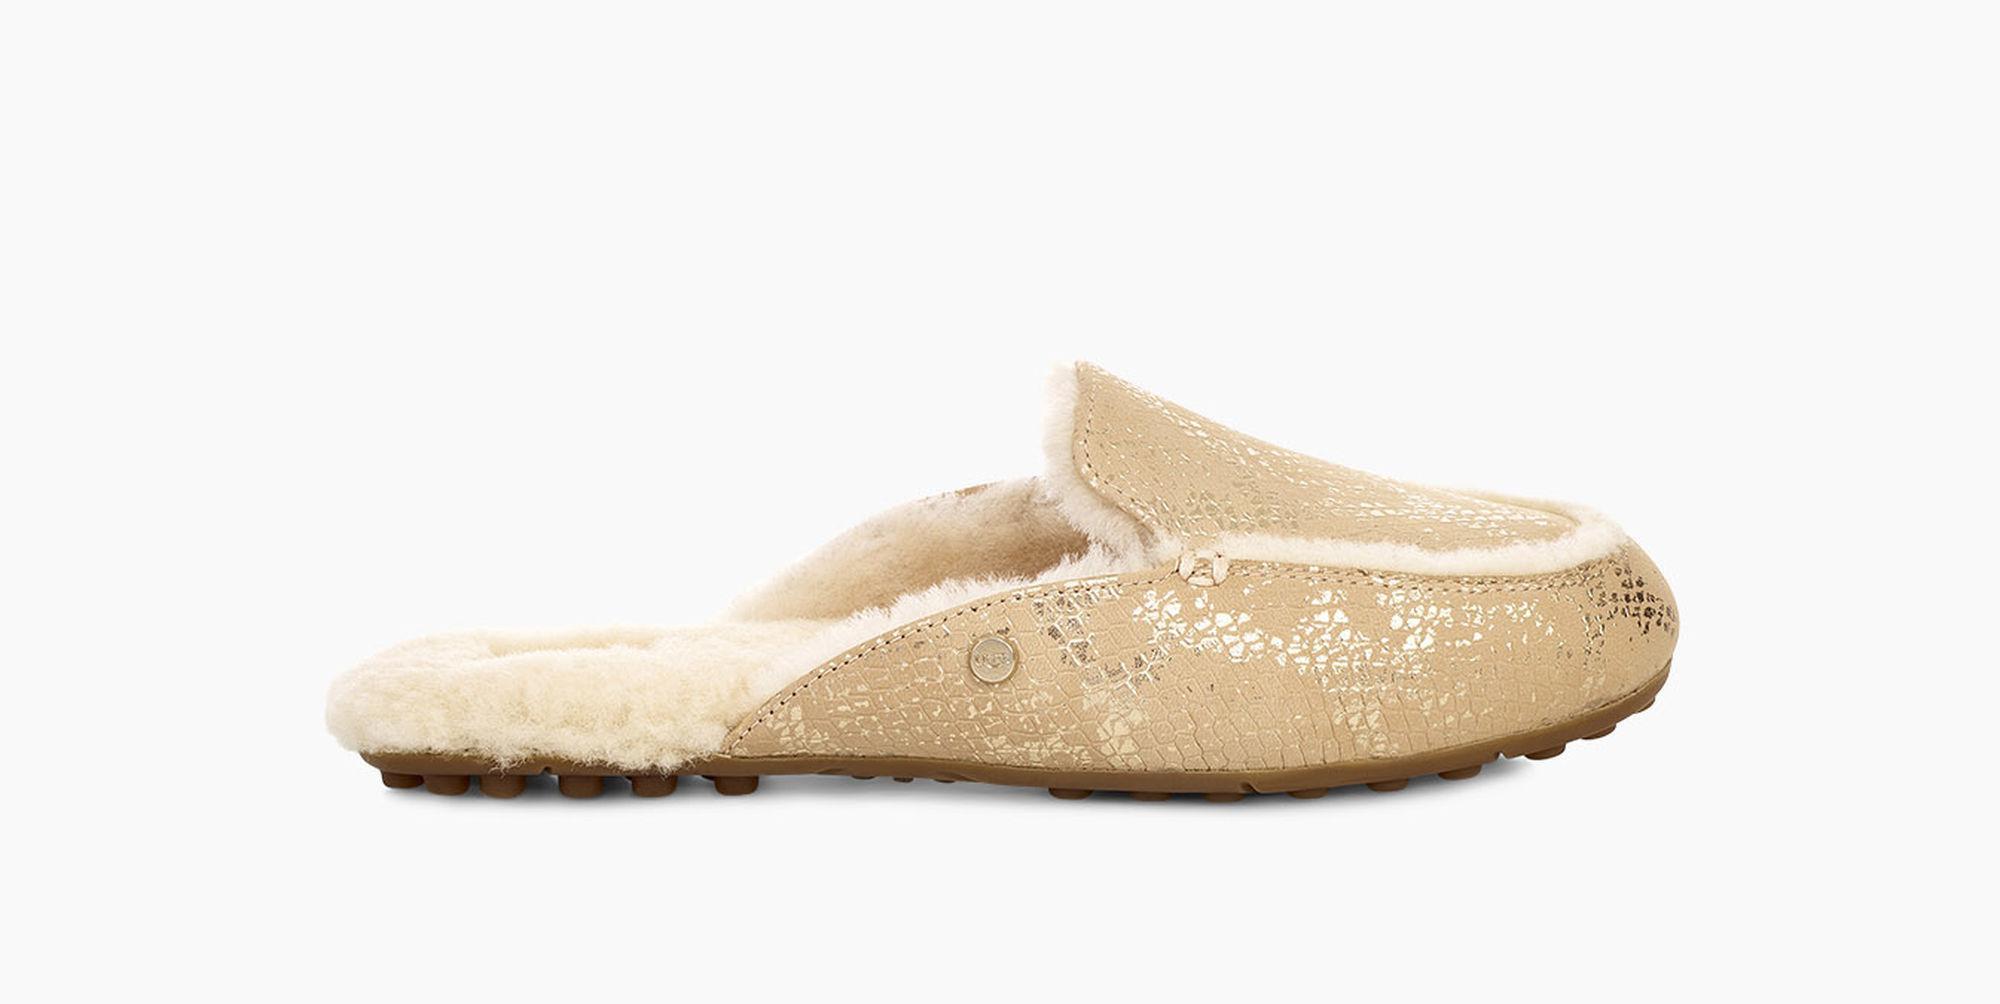 8031e4f8d2d Lyst - UGG Women s Lane Metallic Snake Loafer in Metallic